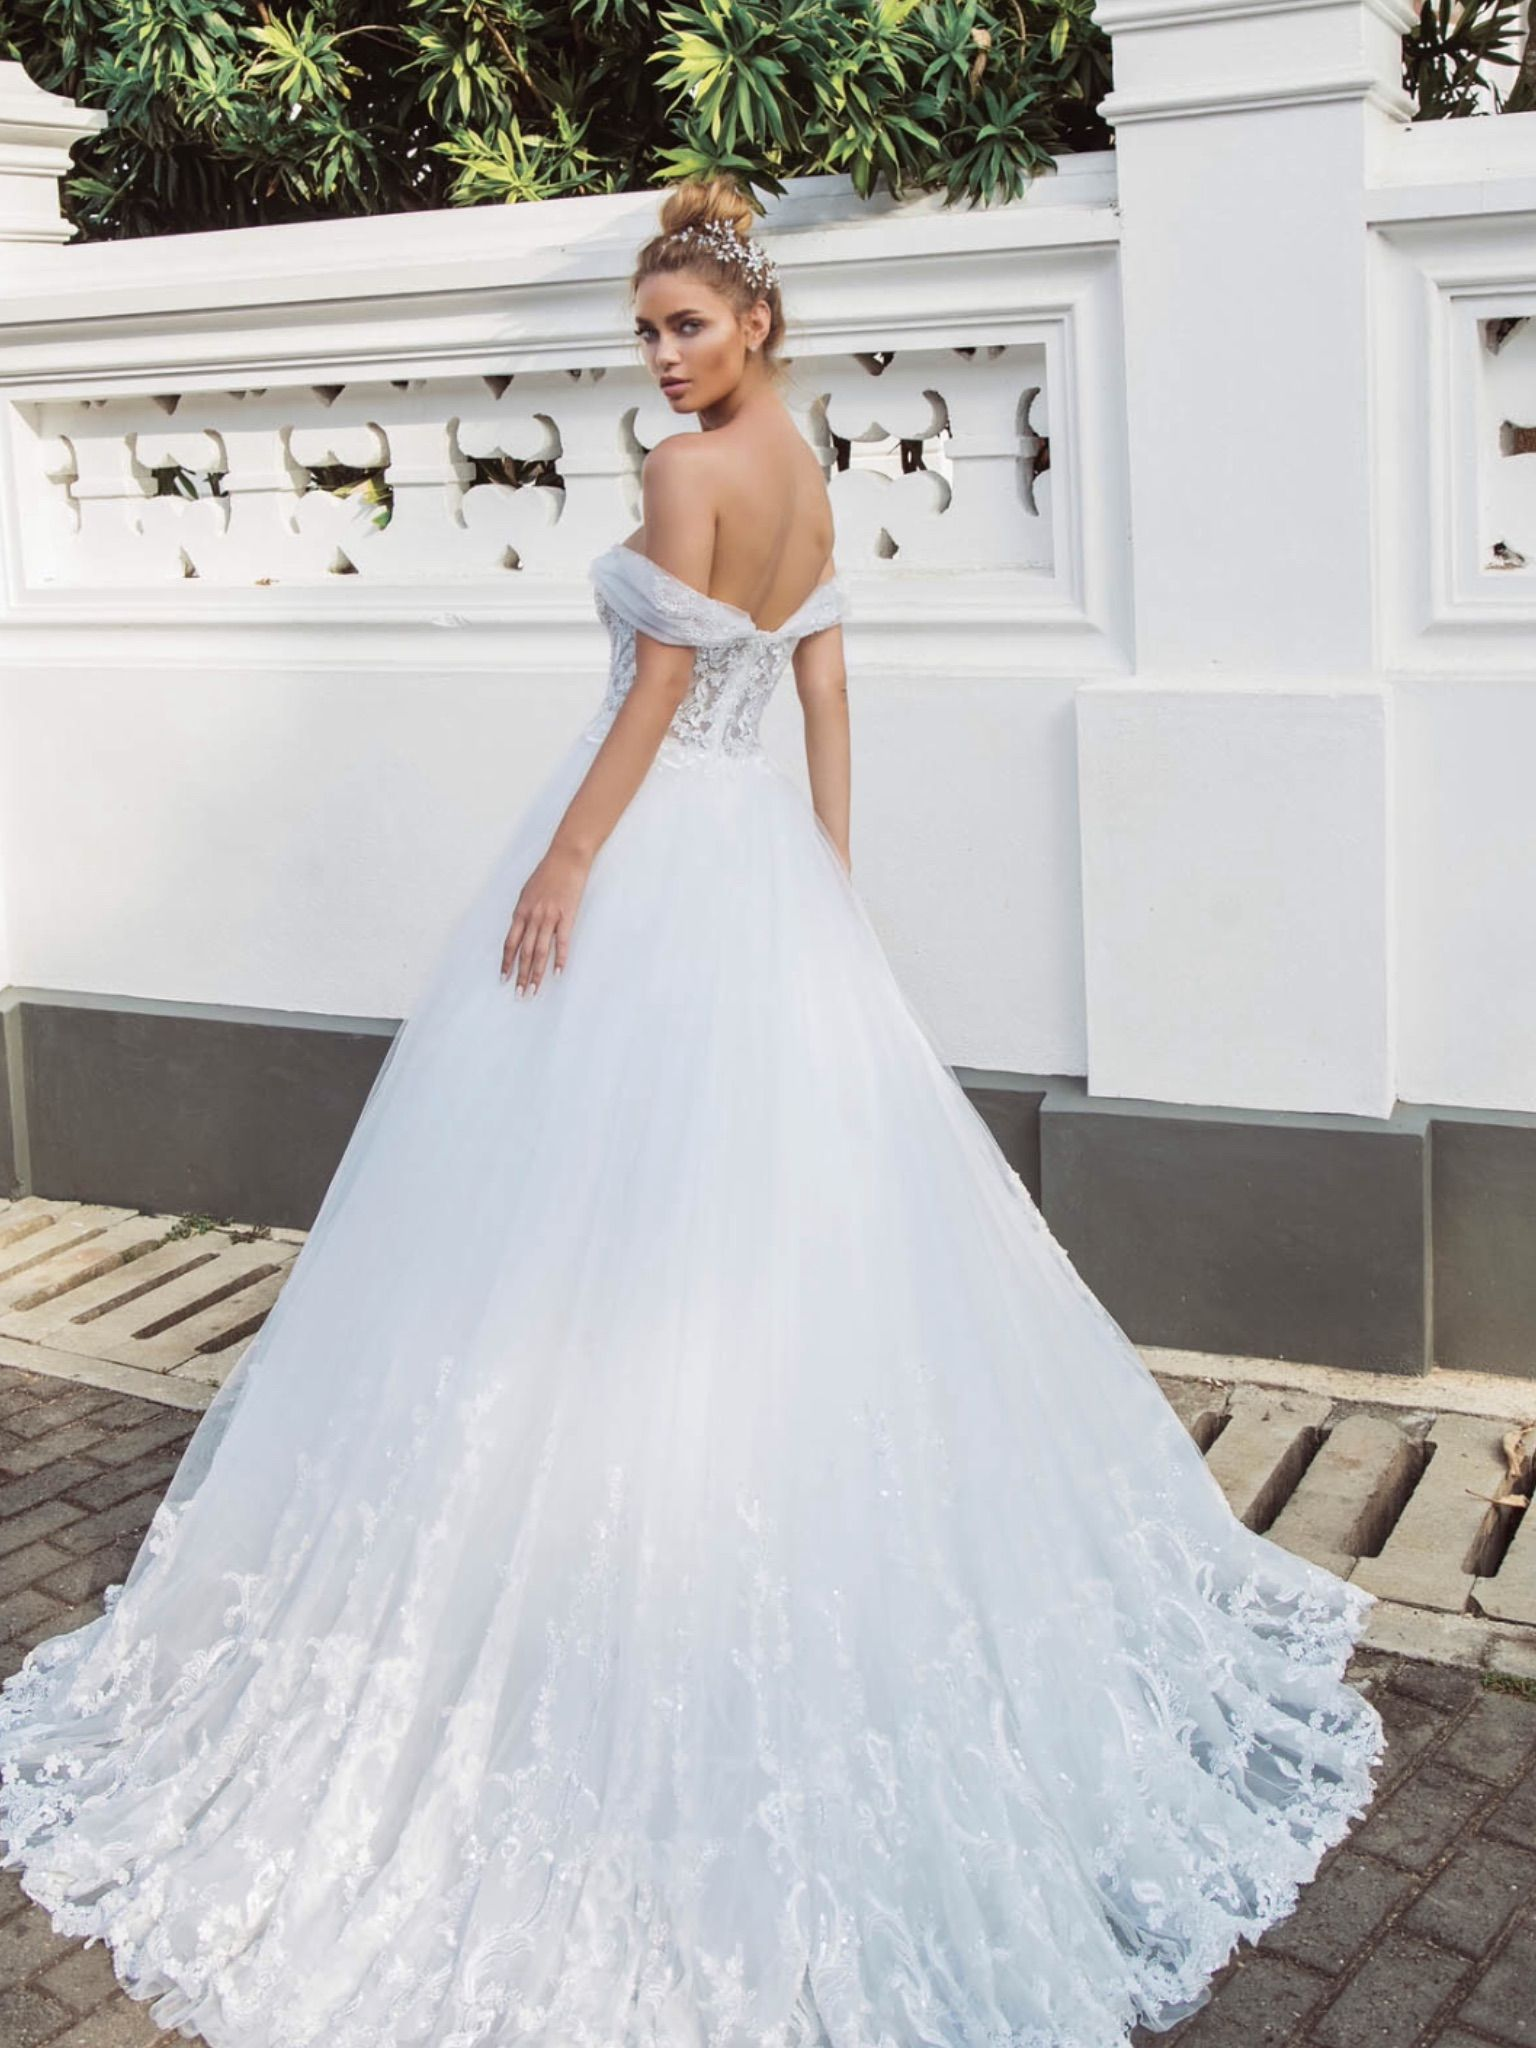 bf8ee509b9de Νυφικα 2019  ρομαντικα νυφικα  νυφικα με εντυπωσιακη πλατη  γοργονε νυφικα   νυφικα με